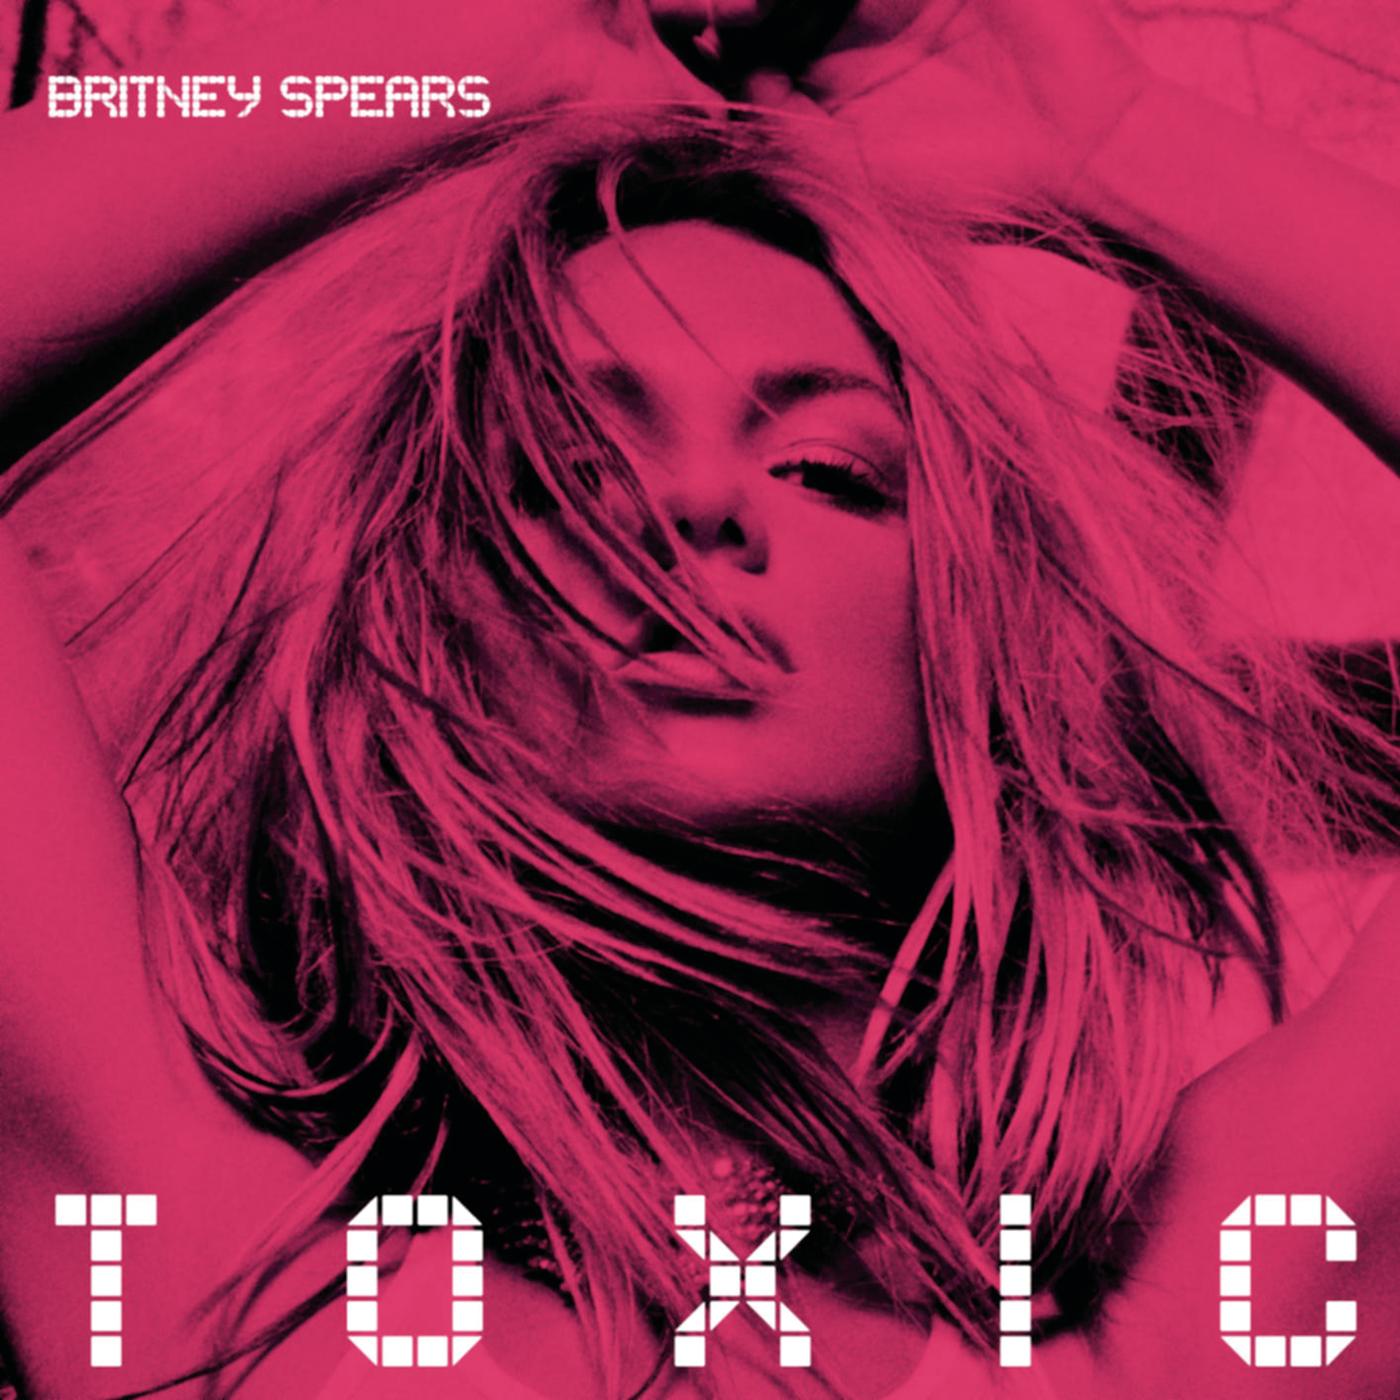 Toxic (Y2K & Alexander Lewis Remix) - Britney Spears